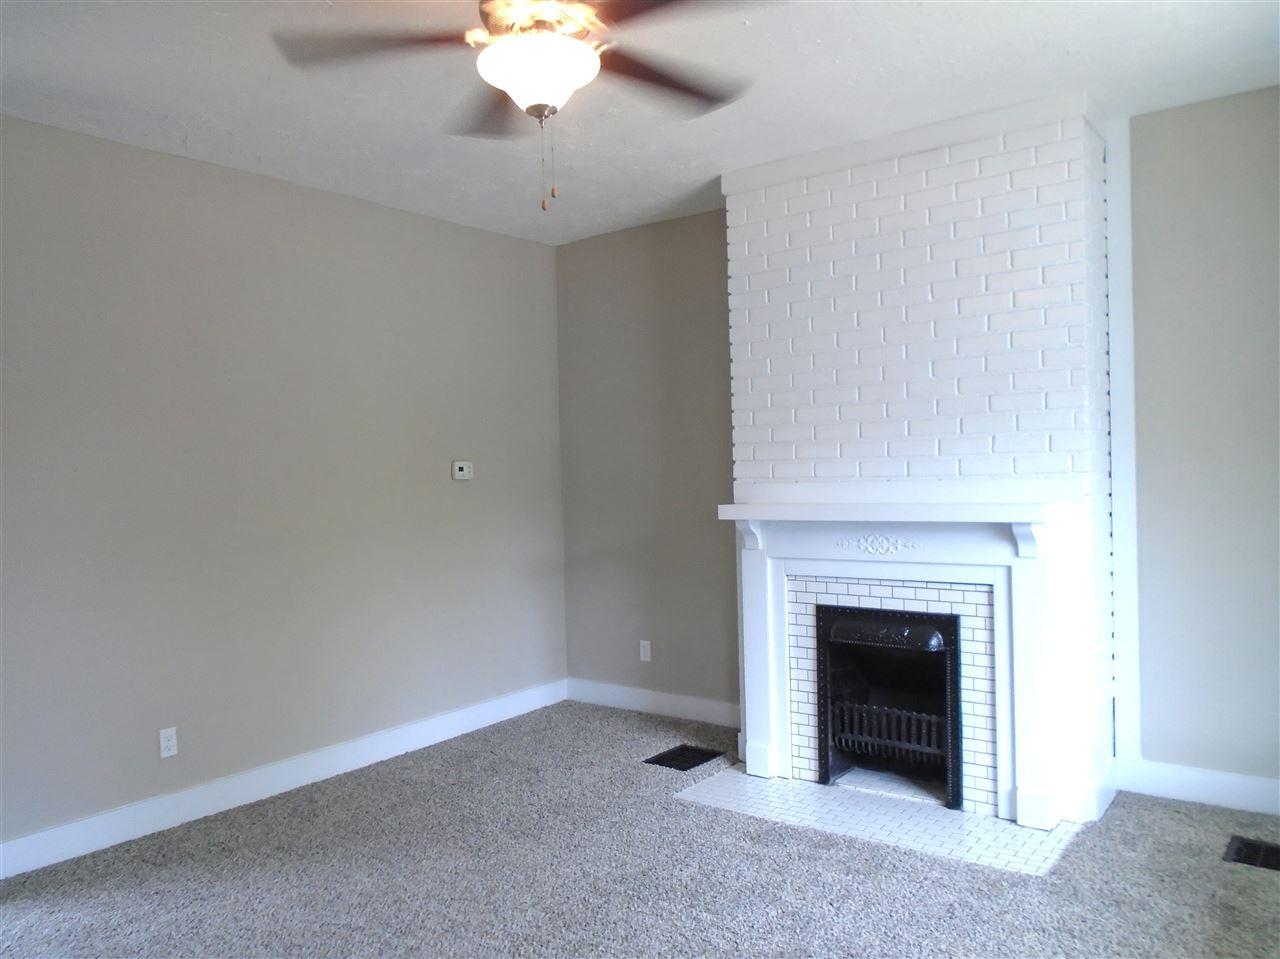 Photo 3 for 926 Maple Ave Dayton, KY 41074